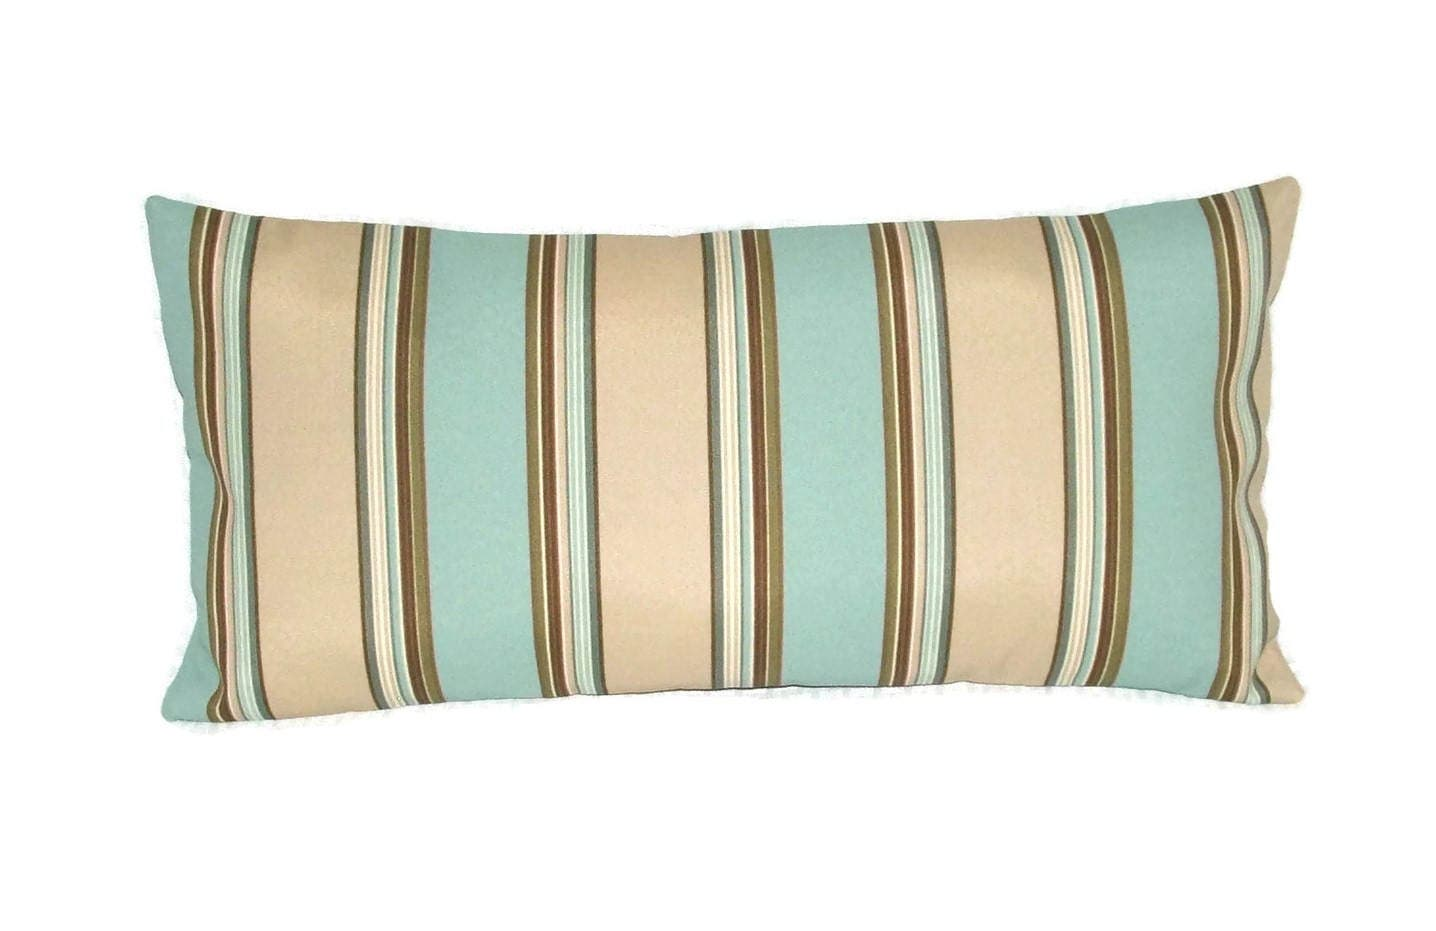 Indoor Outdoor Lumbar Pillow Cover In Beige Brown And Turquoise